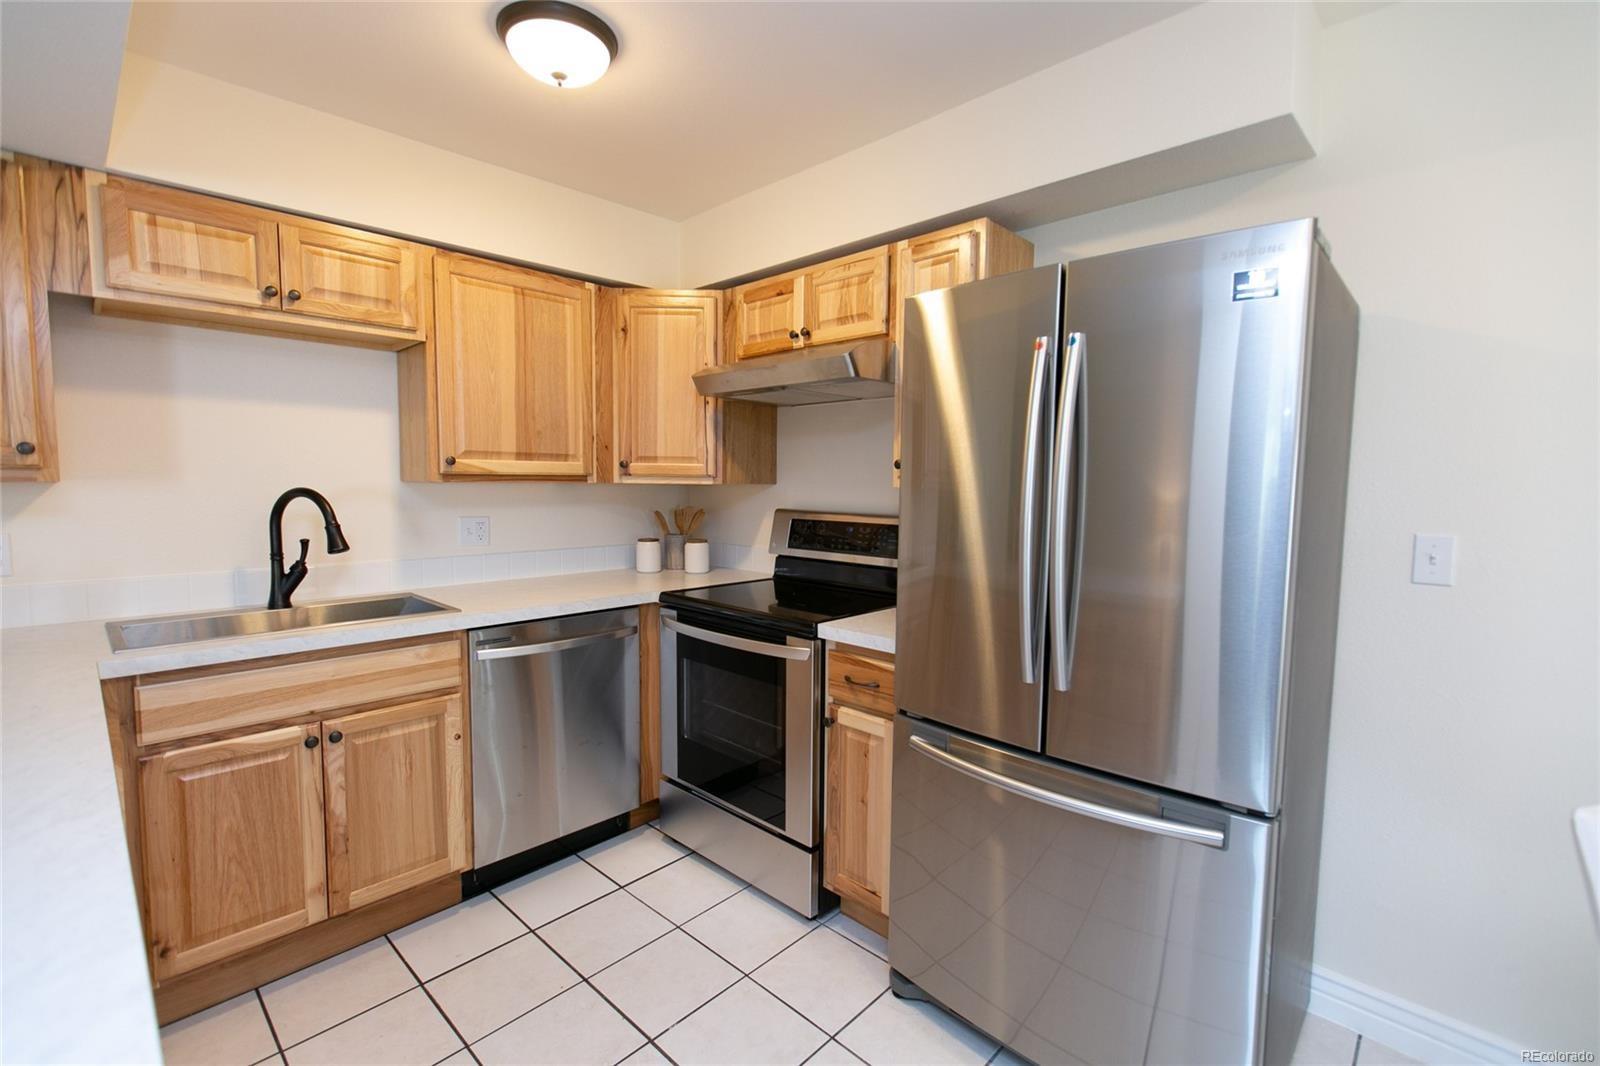 MLS# 4292489 - 3 - 3630 Iris Avenue #B, Boulder, CO 80301